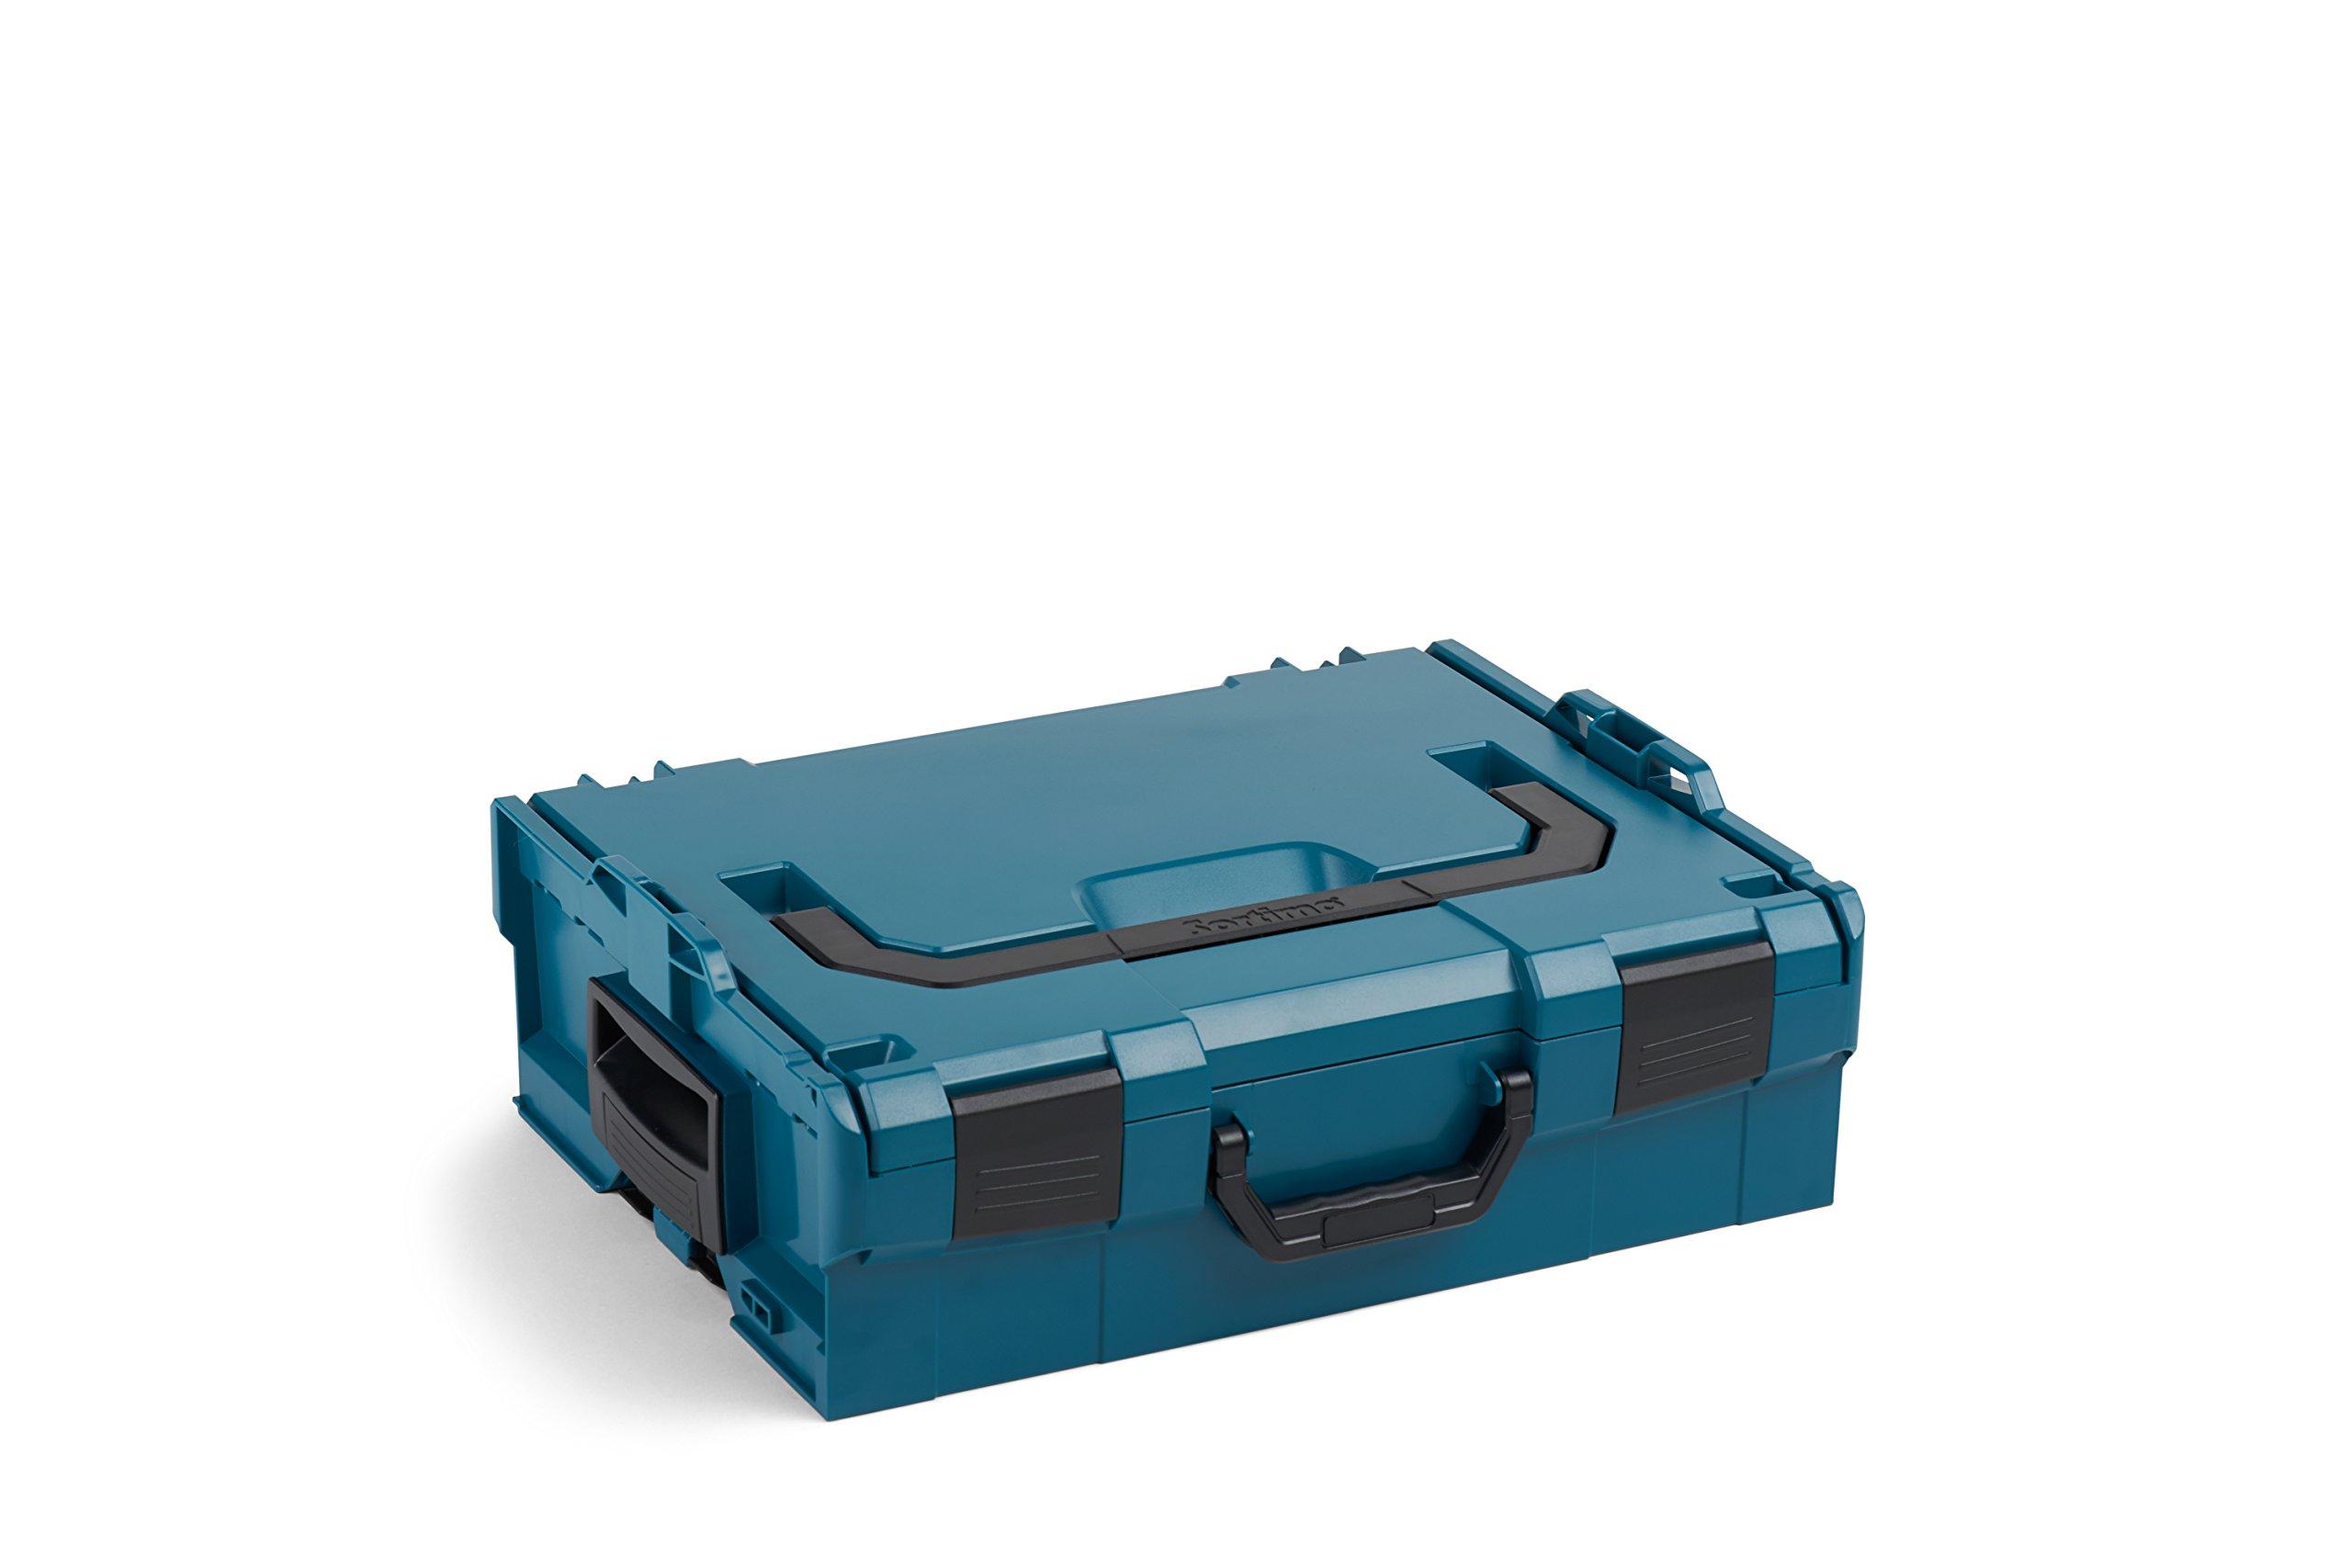 Toolbox Organizer| SORTIMO BOSCH Tool Box L-Boxx 136 Size 2 | Professional Empty Portable Tool Box | Tough Tool Box Latches & Locks | LIMITED Edition